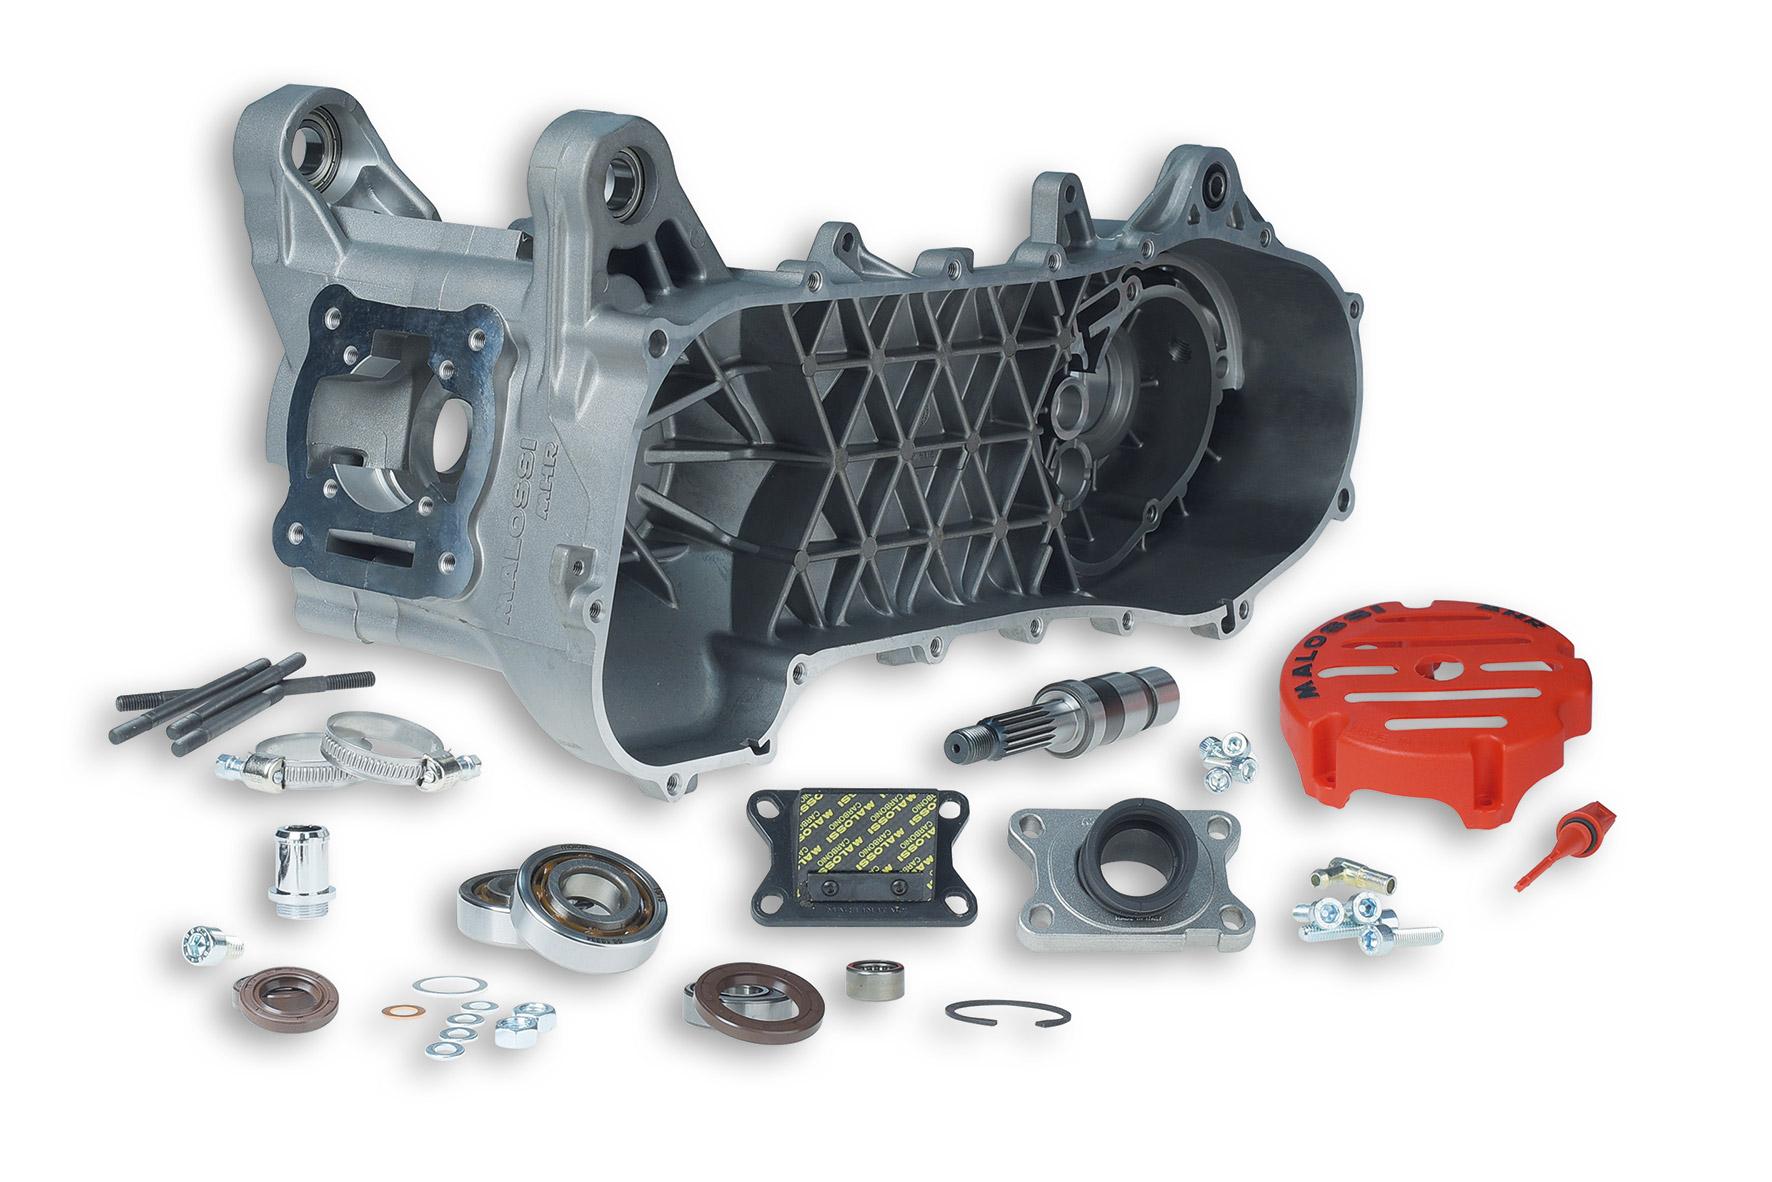 Carter motore completo MHR C - one (per motore YAMAHA)